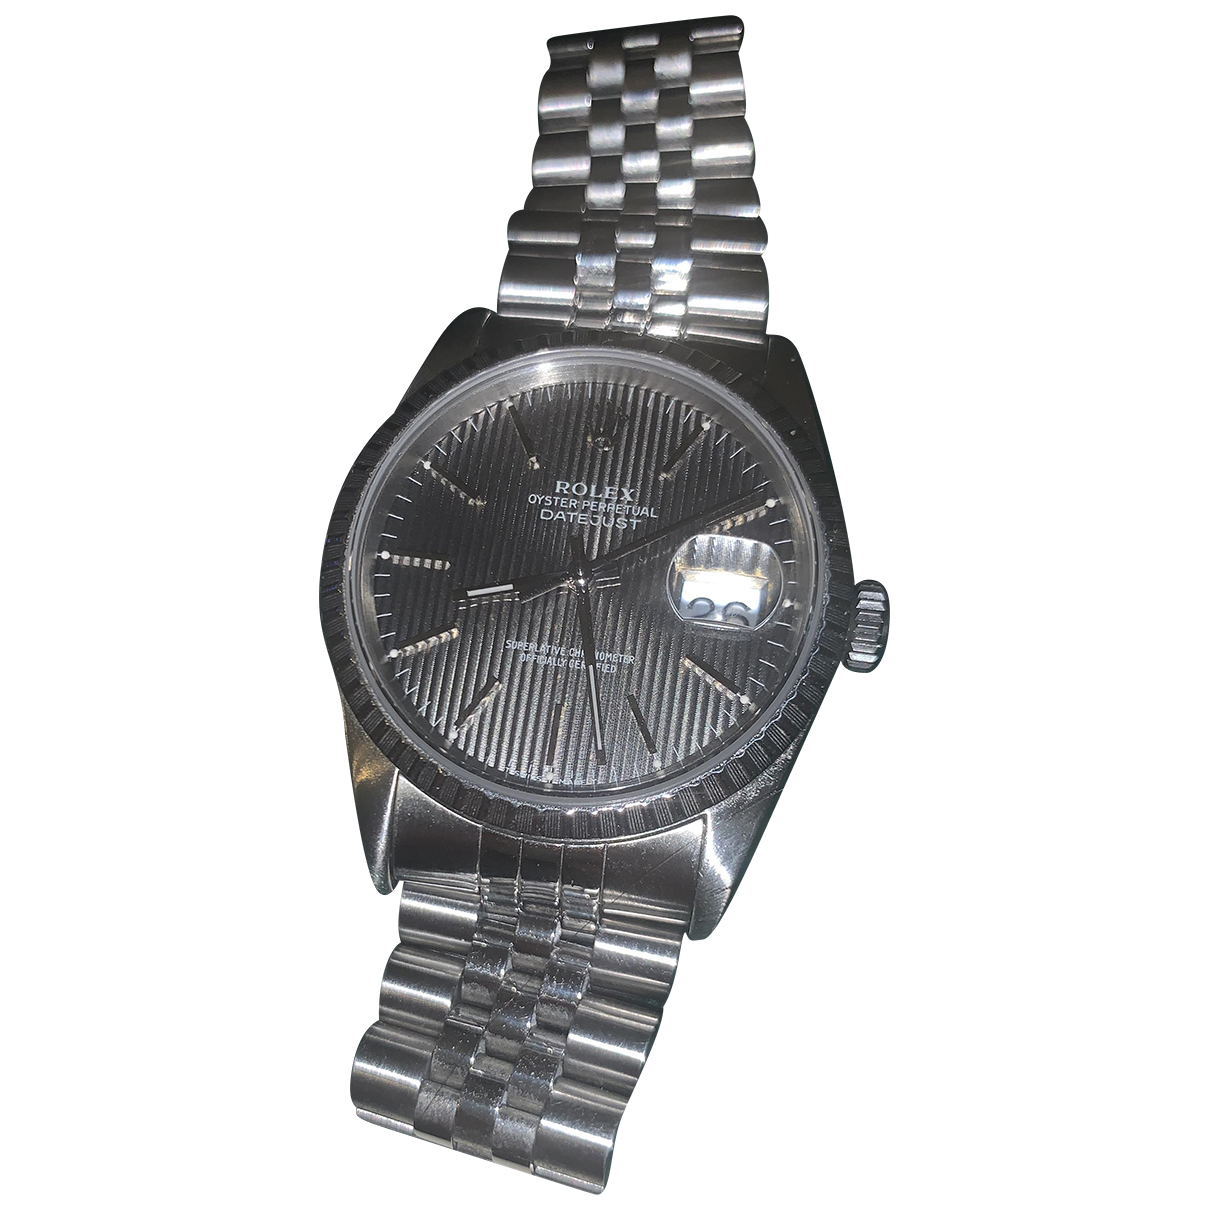 Relojes Datejust 36mm Rolex